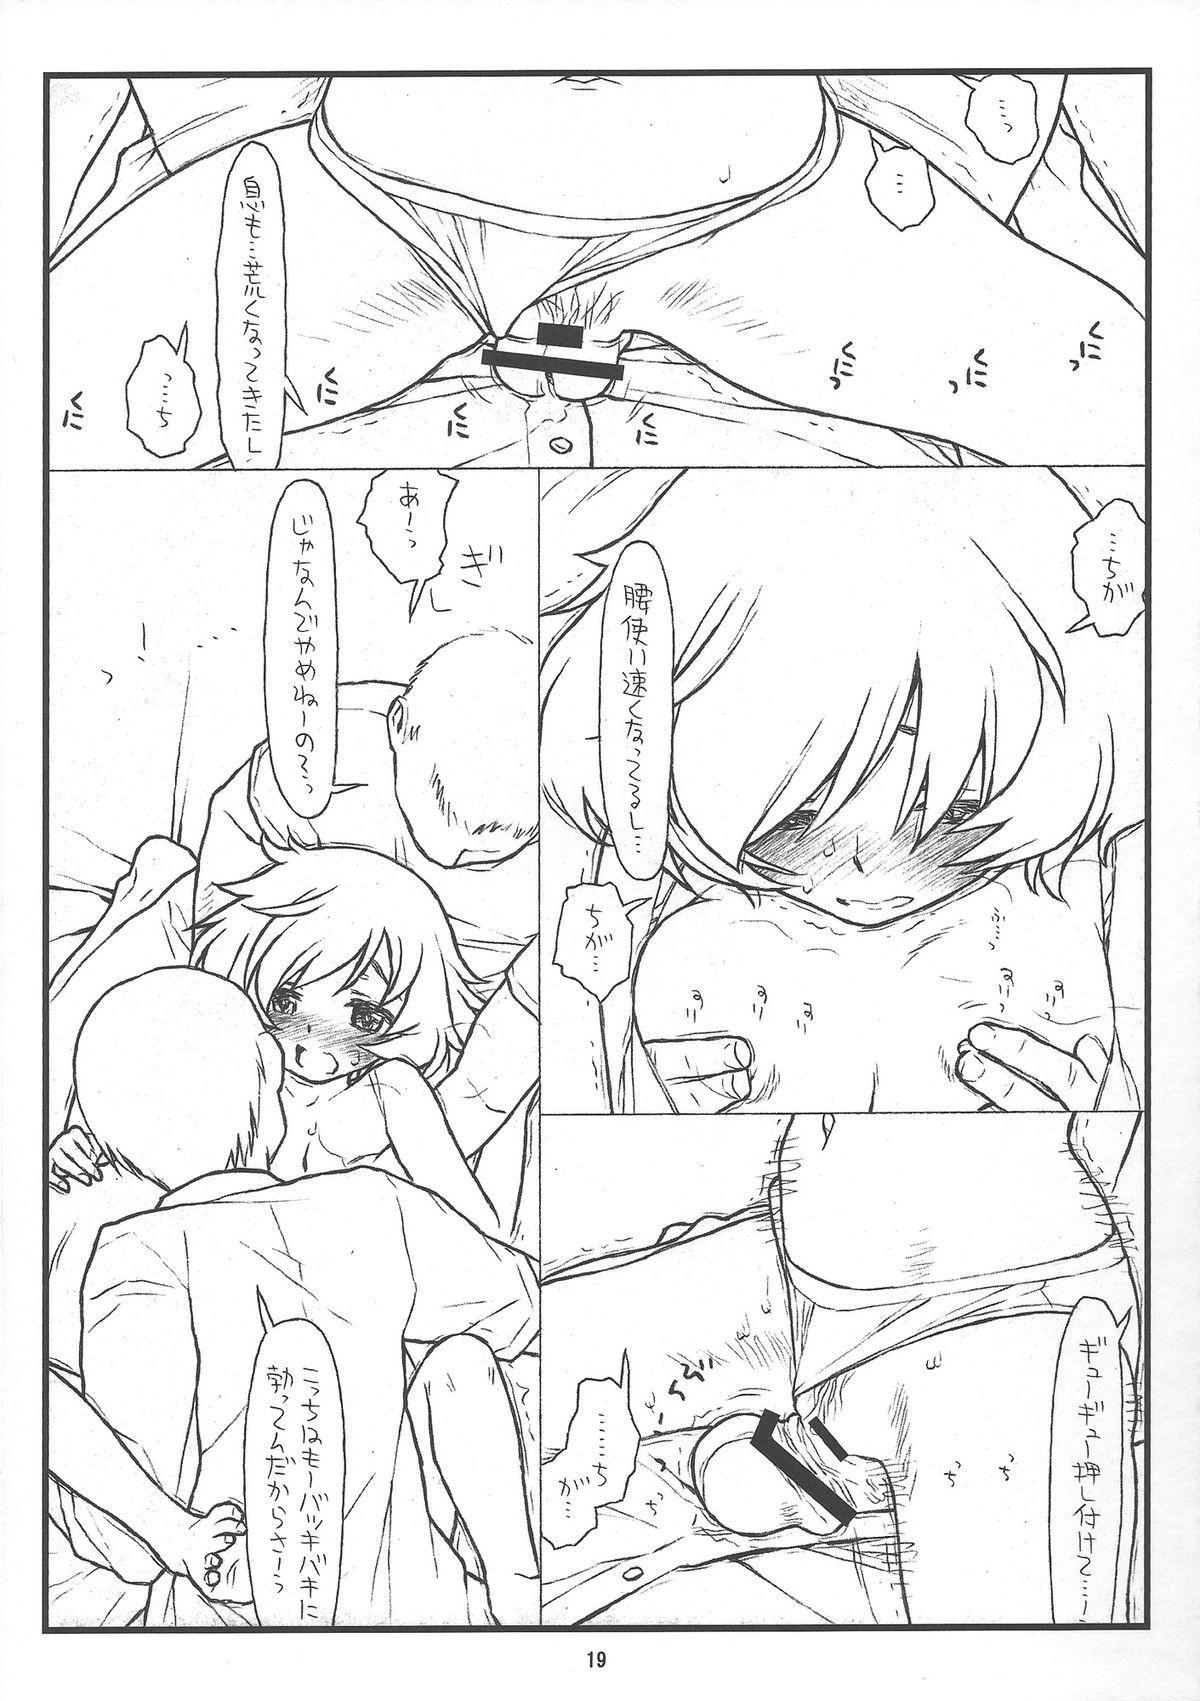 (C84) [bolze.] 「Honanie + Akiyama-dono Sennyudaisakusen (Sippai)」 (Girls und Panzer) 18